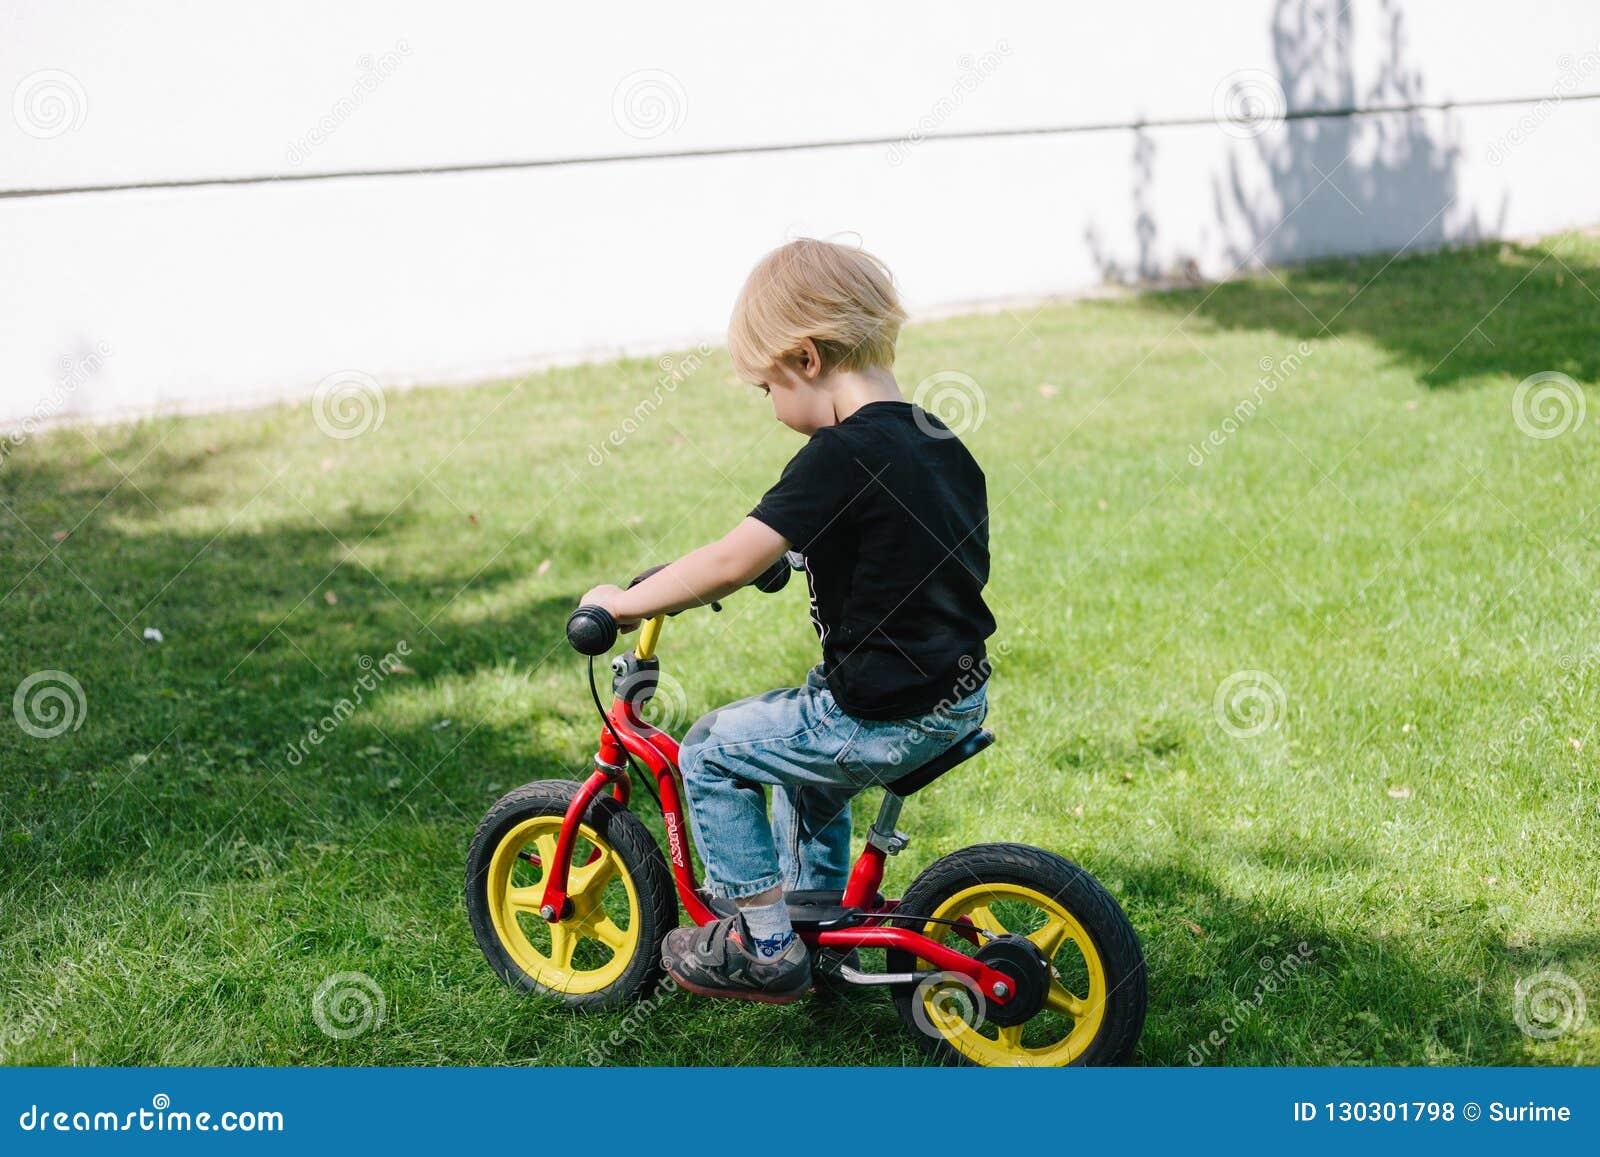 Caucasian Kid On Bicycle Stock Photo Image Of Beautiful 130301798